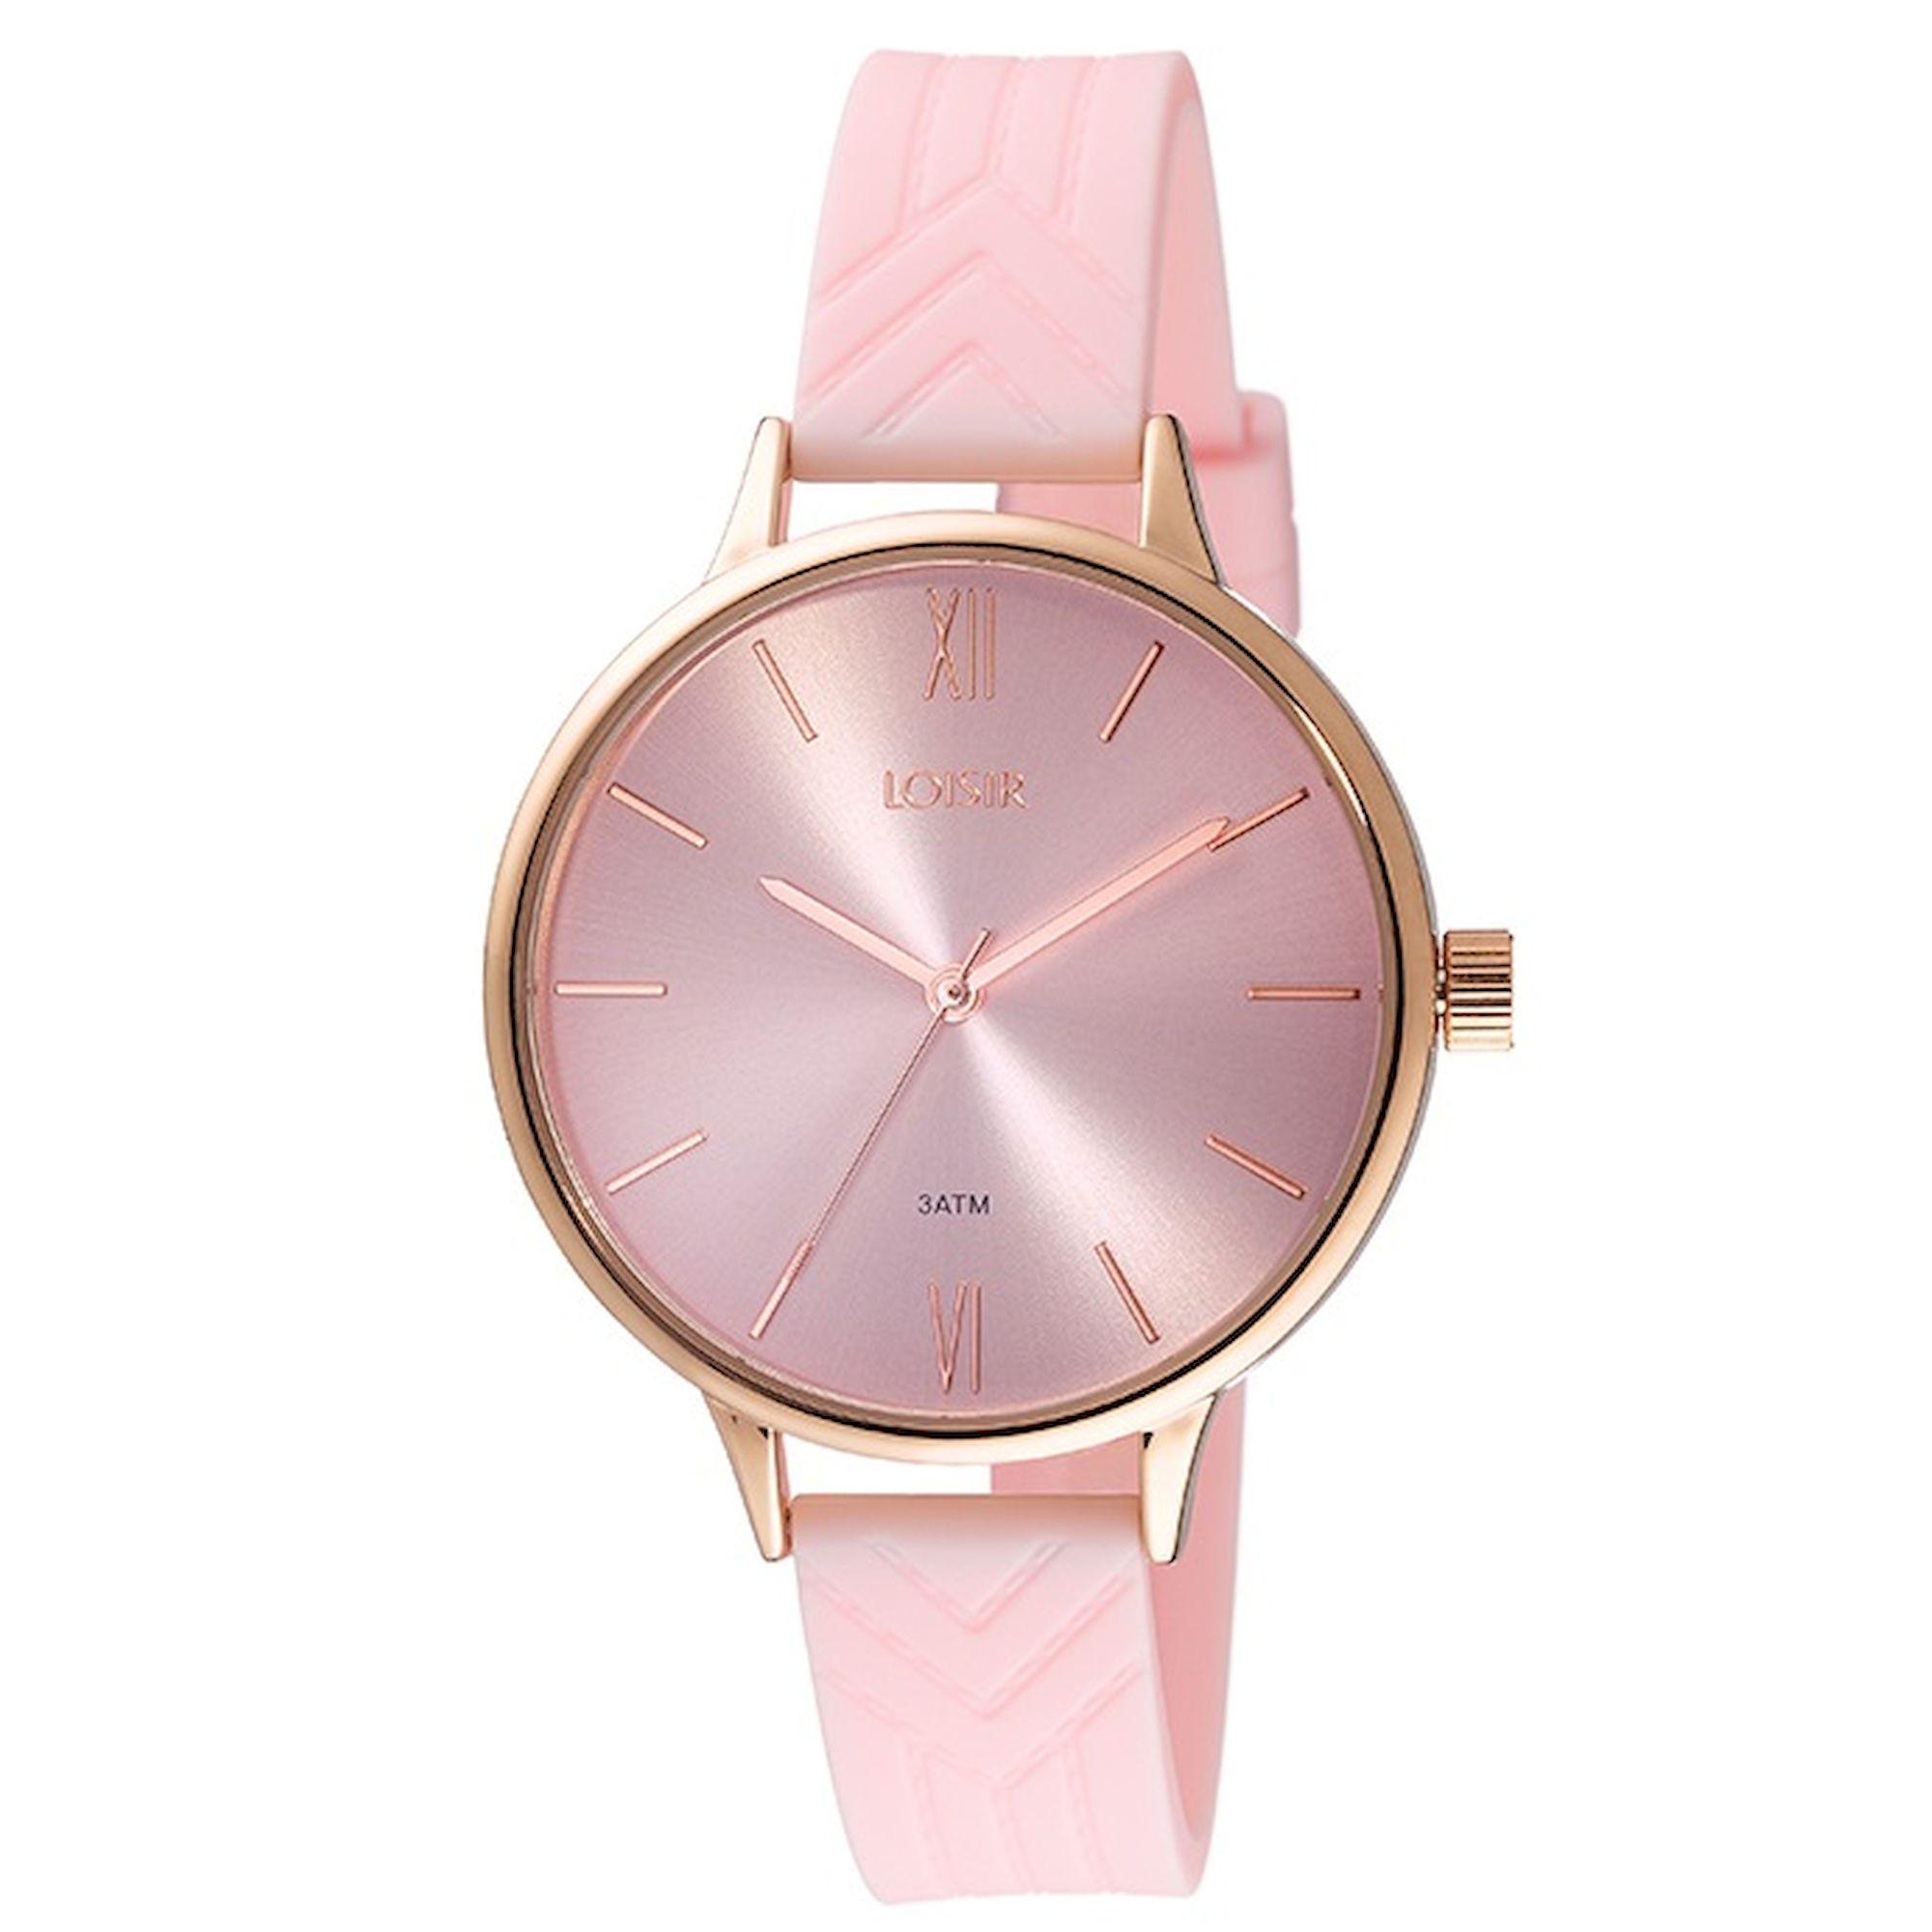 Loisir Ρολόι Paradise, γυναικείο ρολόι, ρολόι loisir, loisir , Δωρεάν έξοδα αποστολής, Αμεση Διαθεσιμότητα, λοισιρ γυναικεία ρολόγια